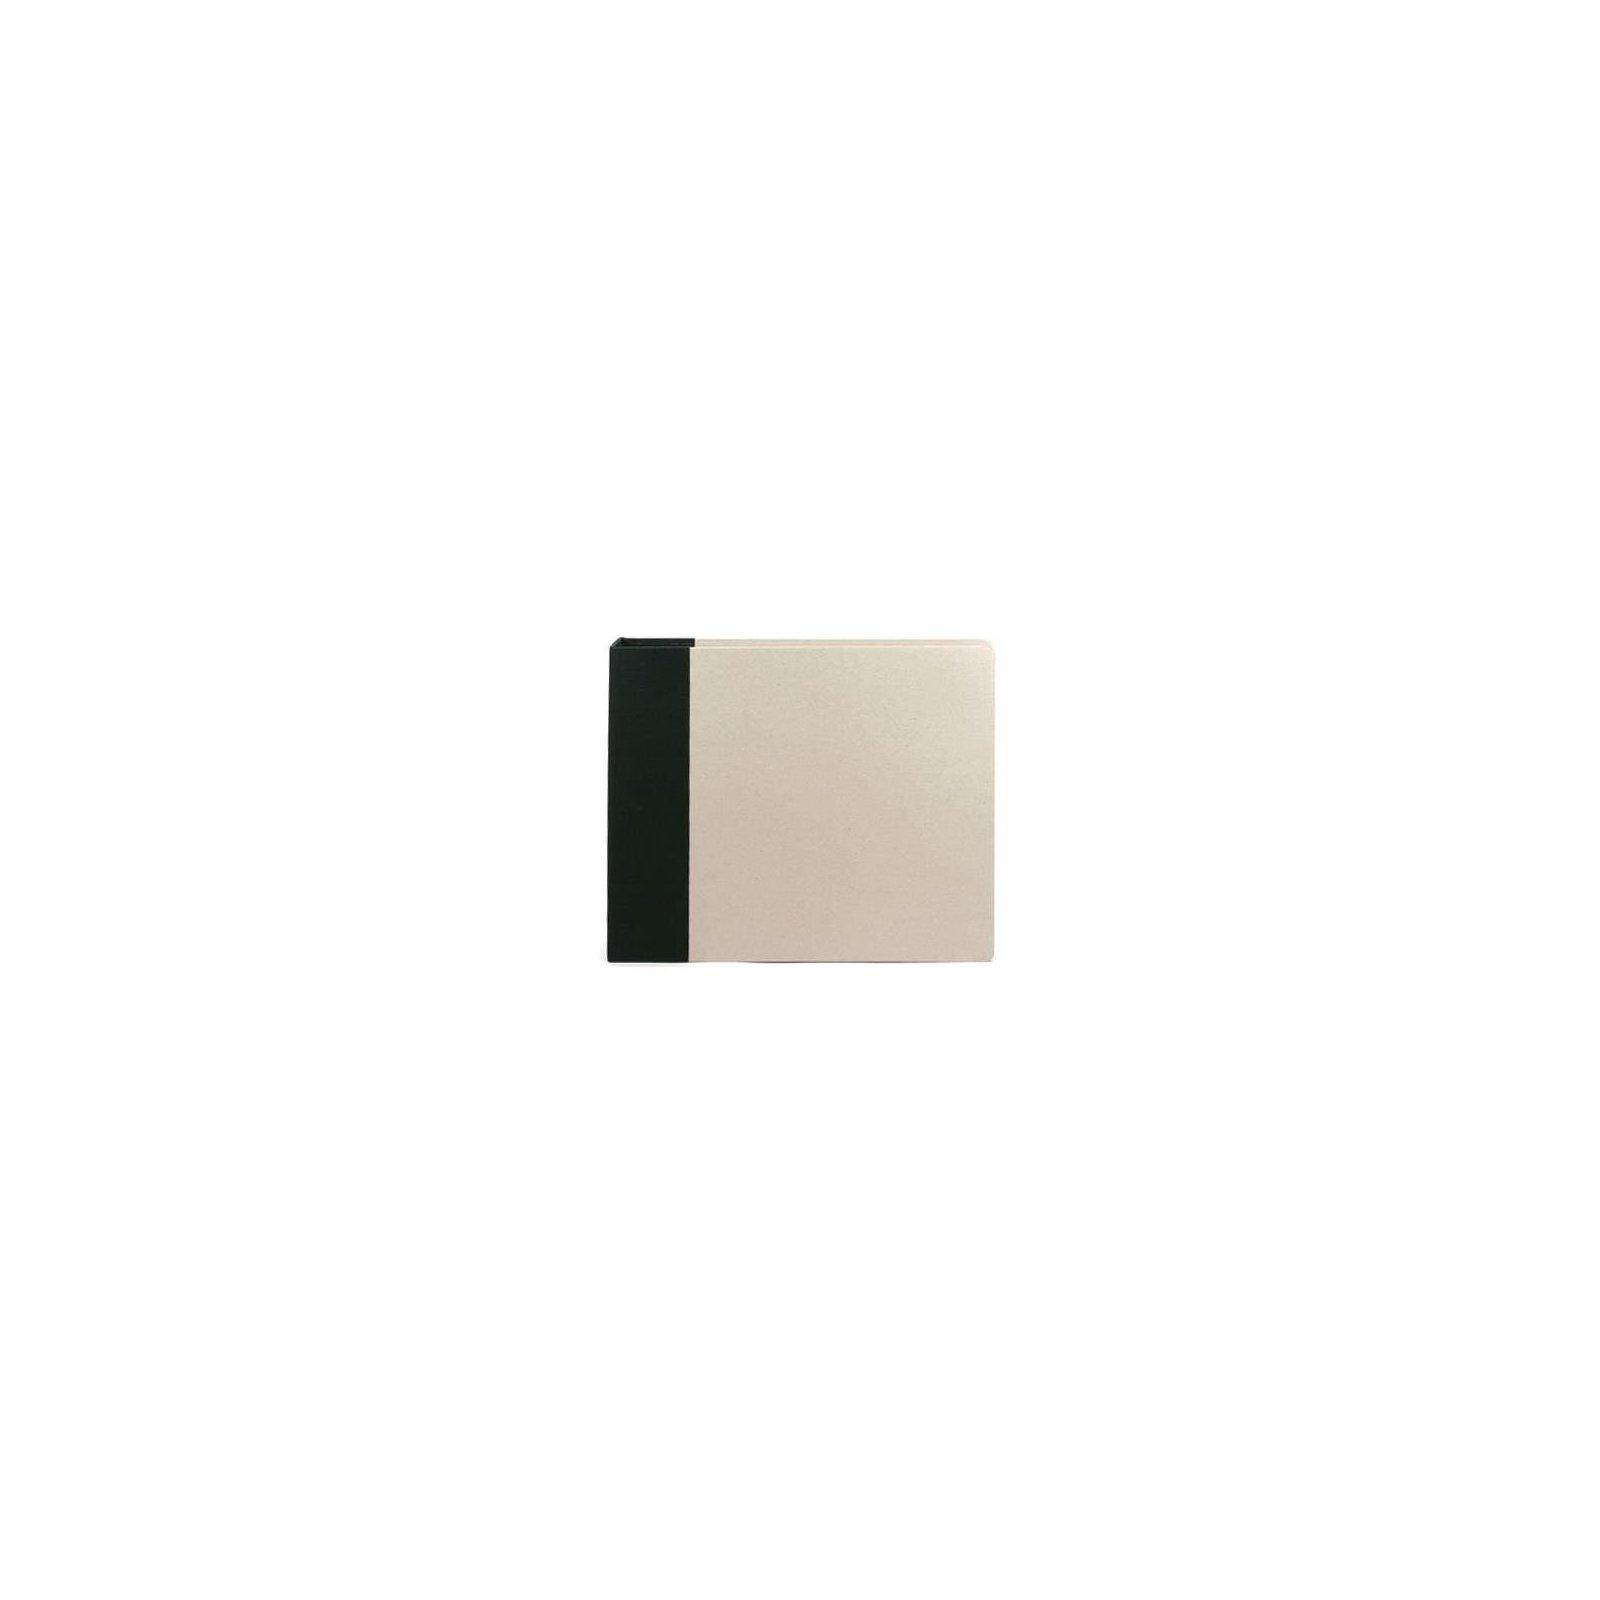 Album à personnaliser - Noir - Black - 30x30 - We R Memory Keepers